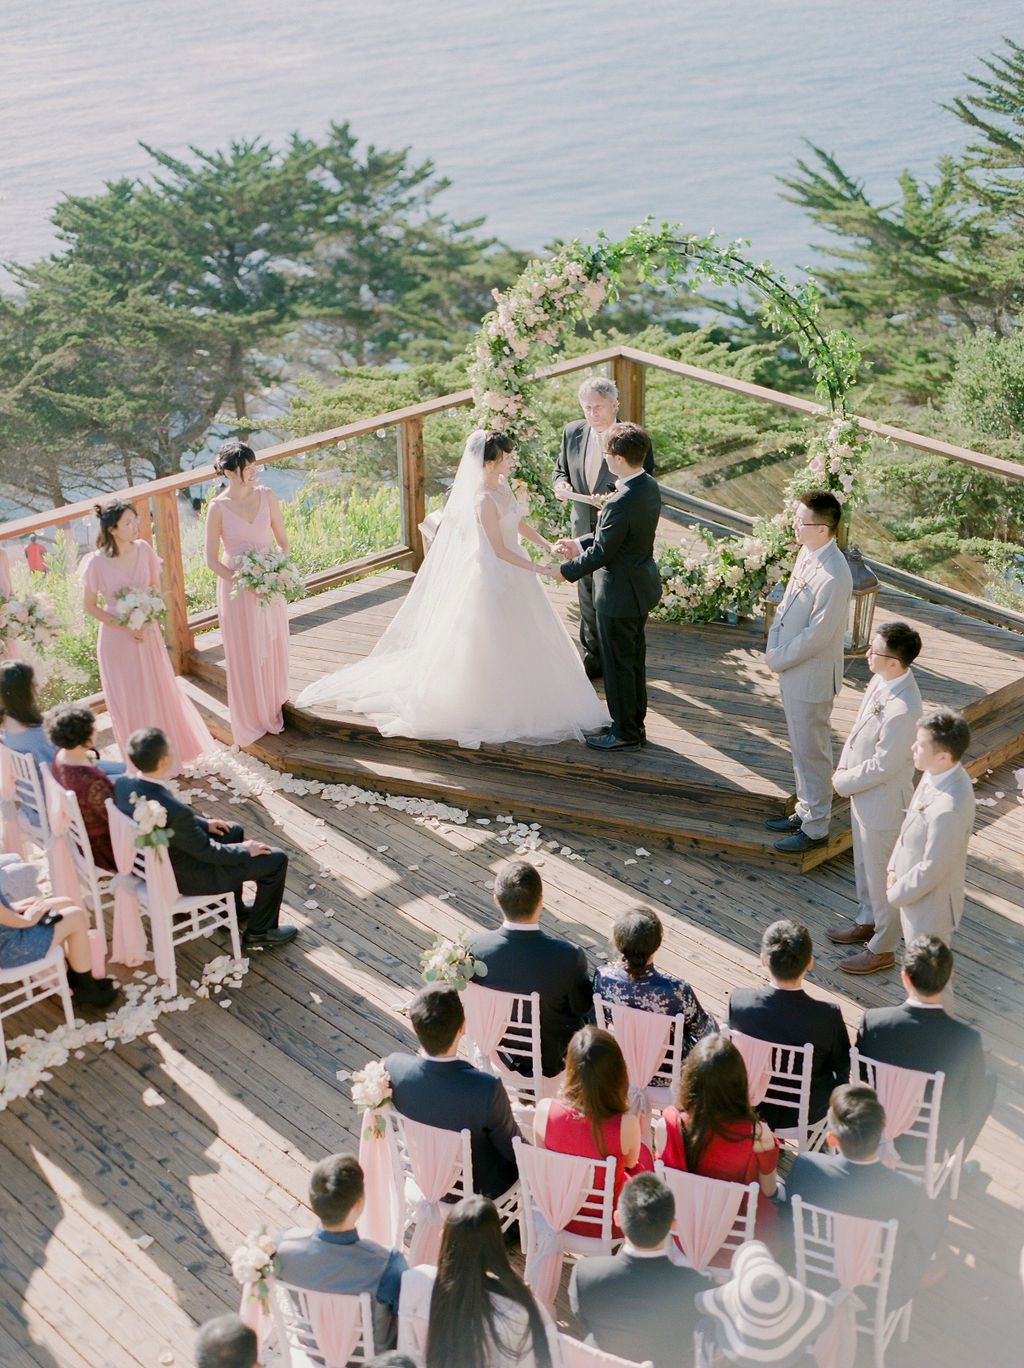 Wedding Ceremony At Hyatt Carmel Highlands Event Planning Styling Design Manna Sun Events Photographer Stella Yang Event Planning Event Photographer